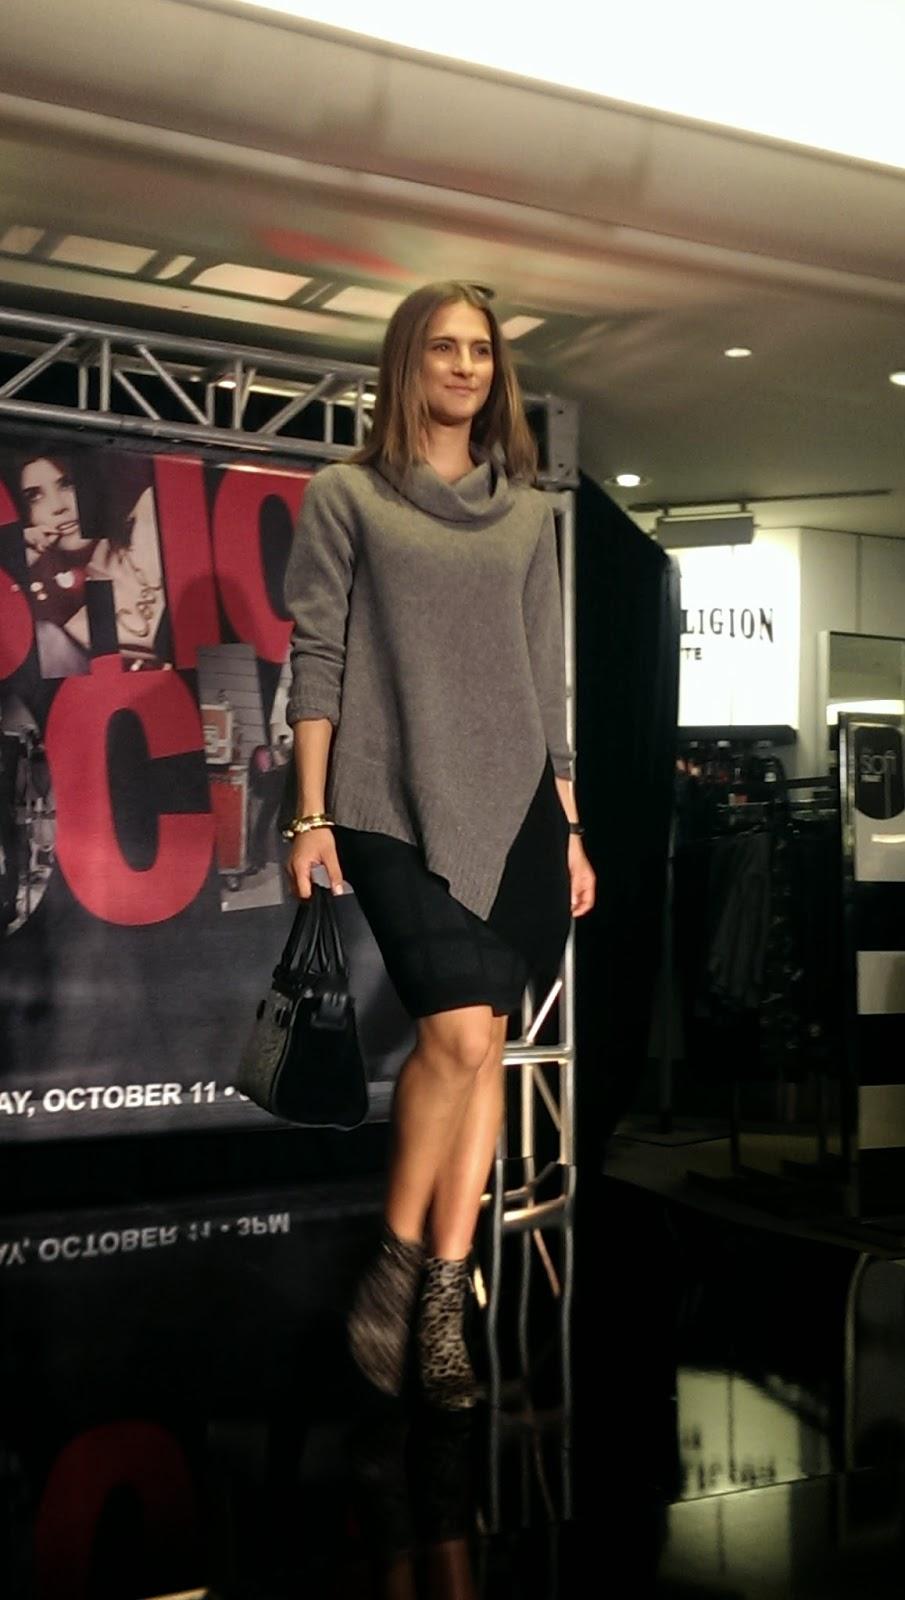 Fashion%2BRocks%2BMacy Fashion Rocks @ Macy's with Lawrence Zarian #FashionRocks @Lawrencezarian